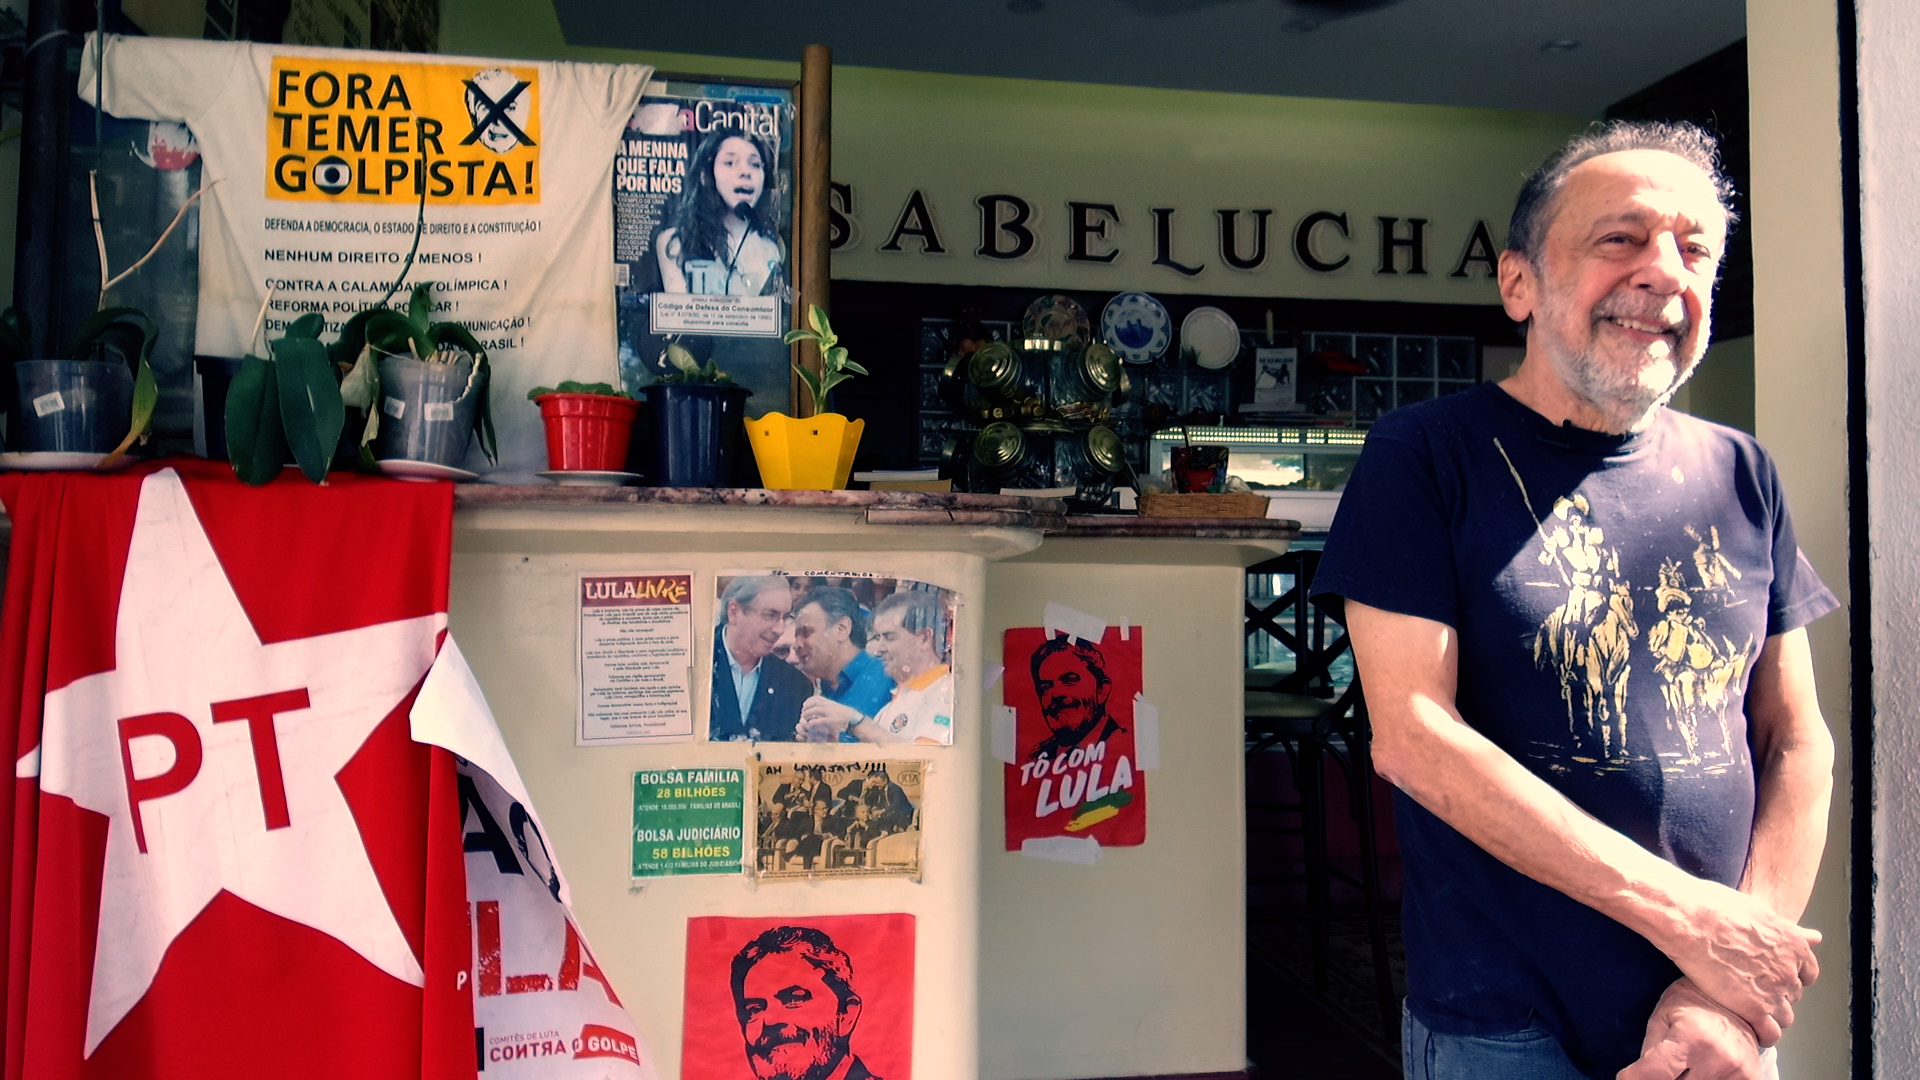 Café Sabelucha